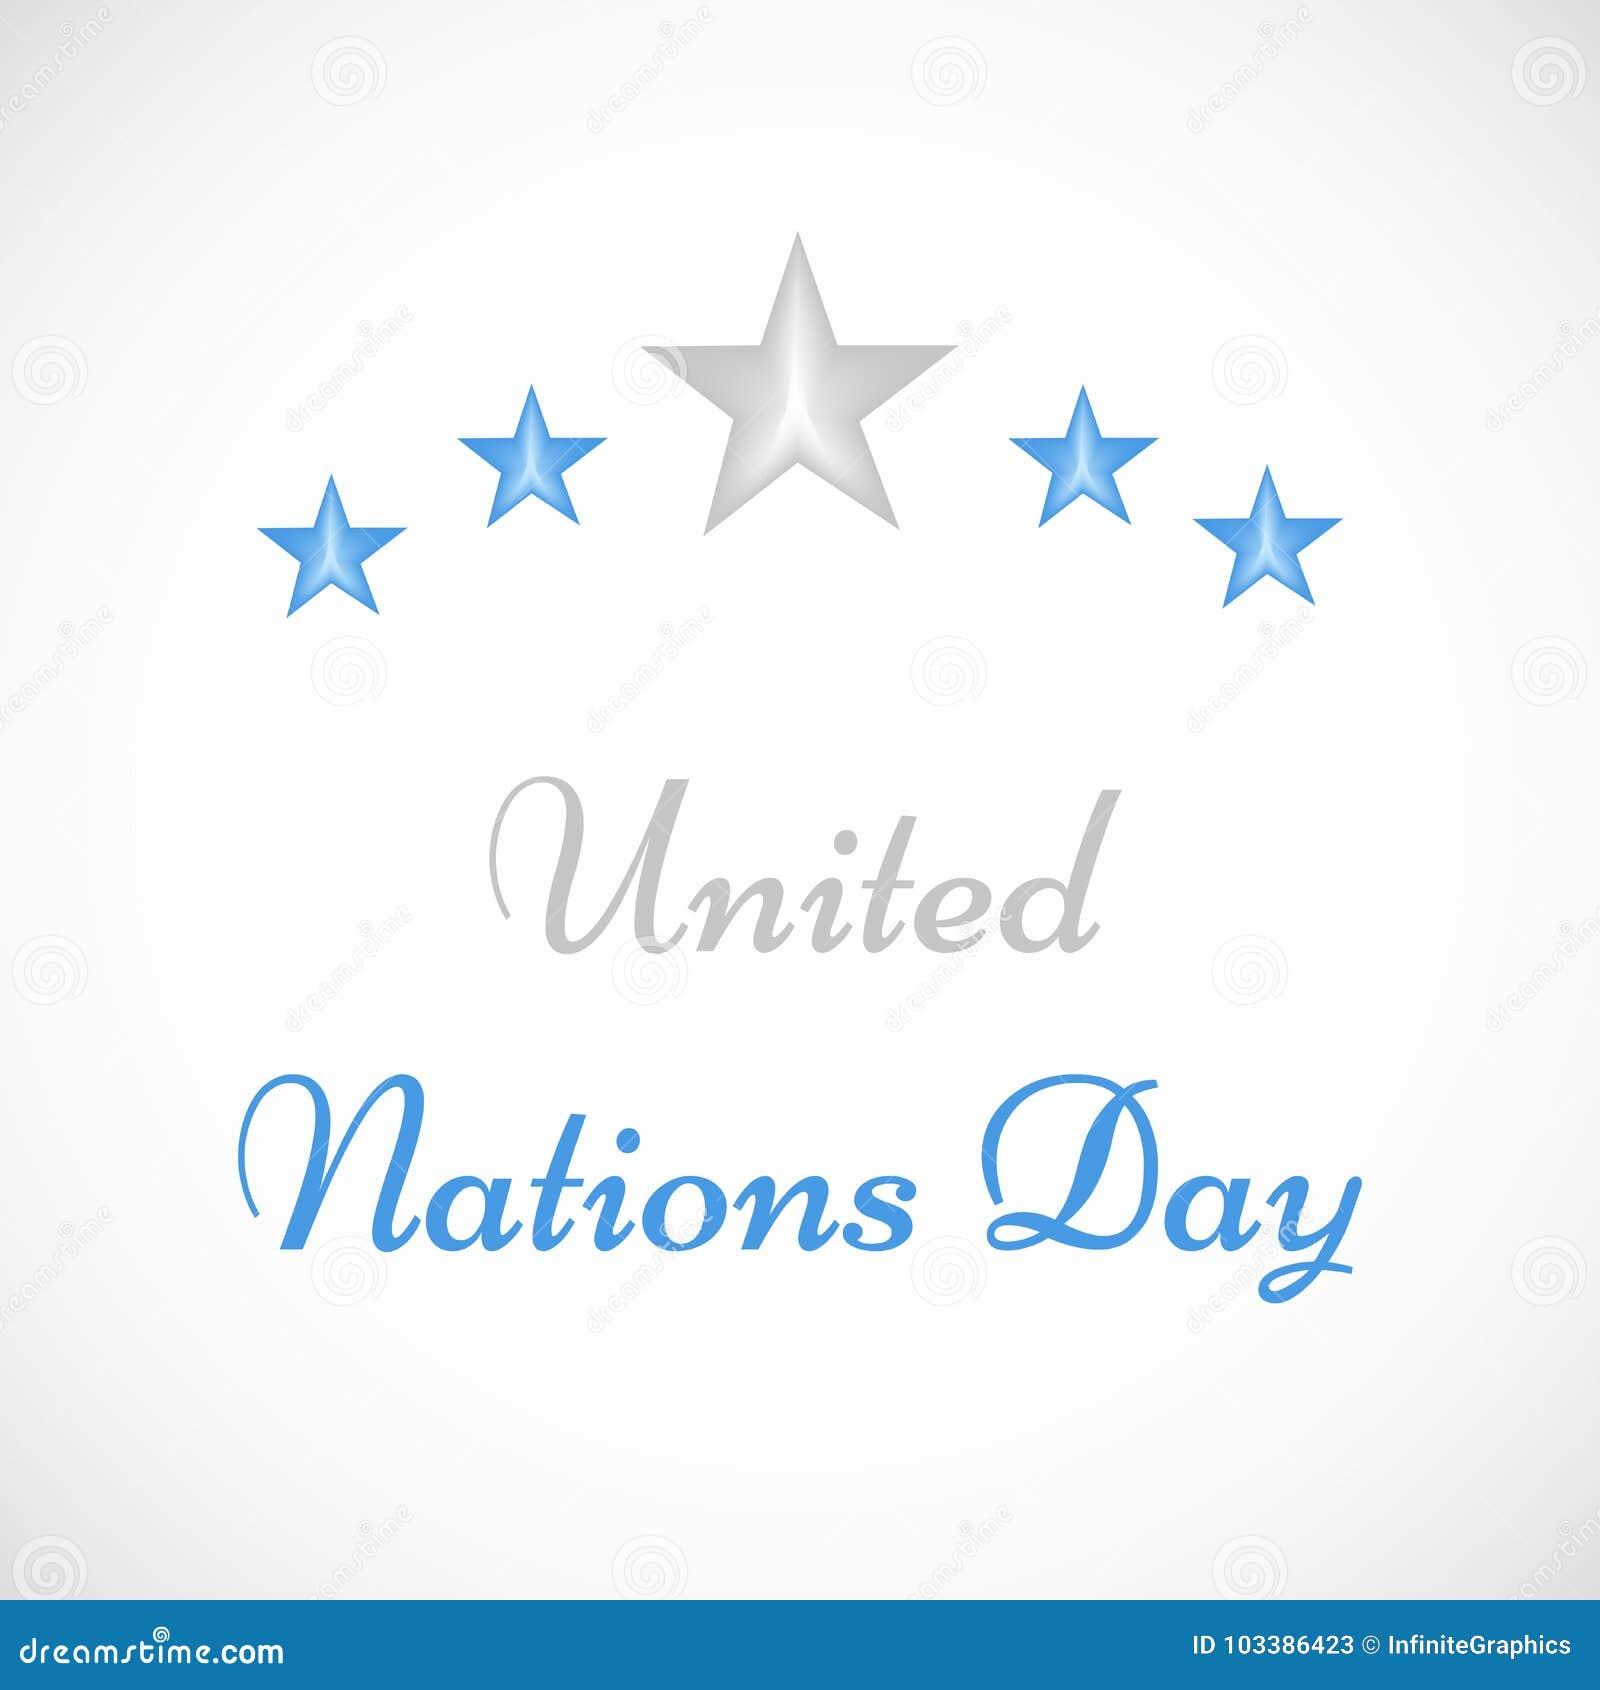 Illustration of United Nations Day Background